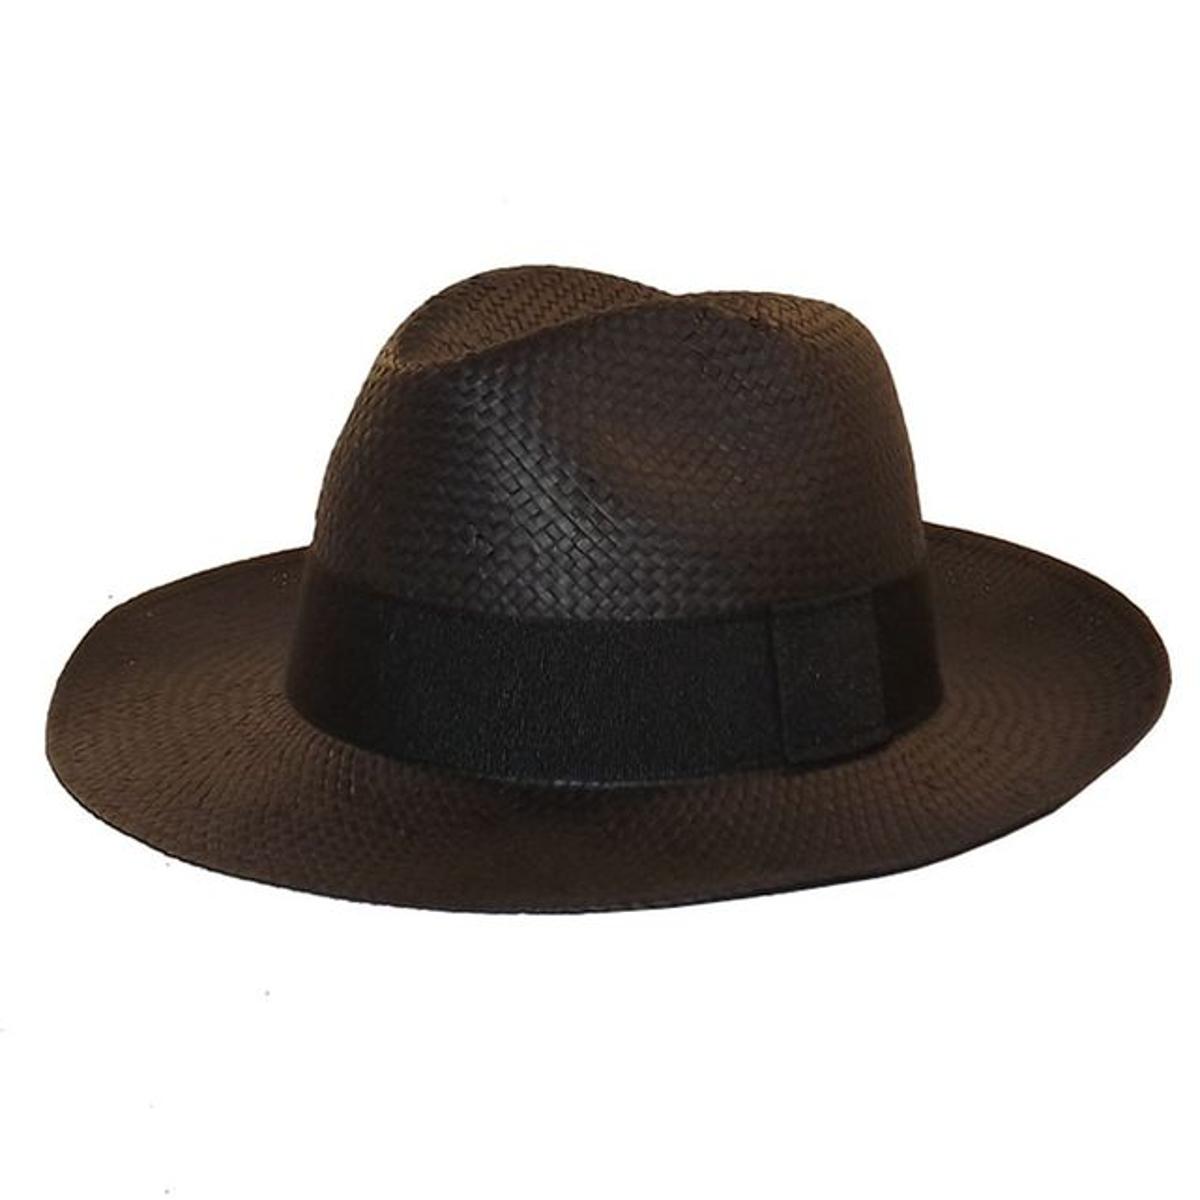 Chapeau style panama noir ruban noir